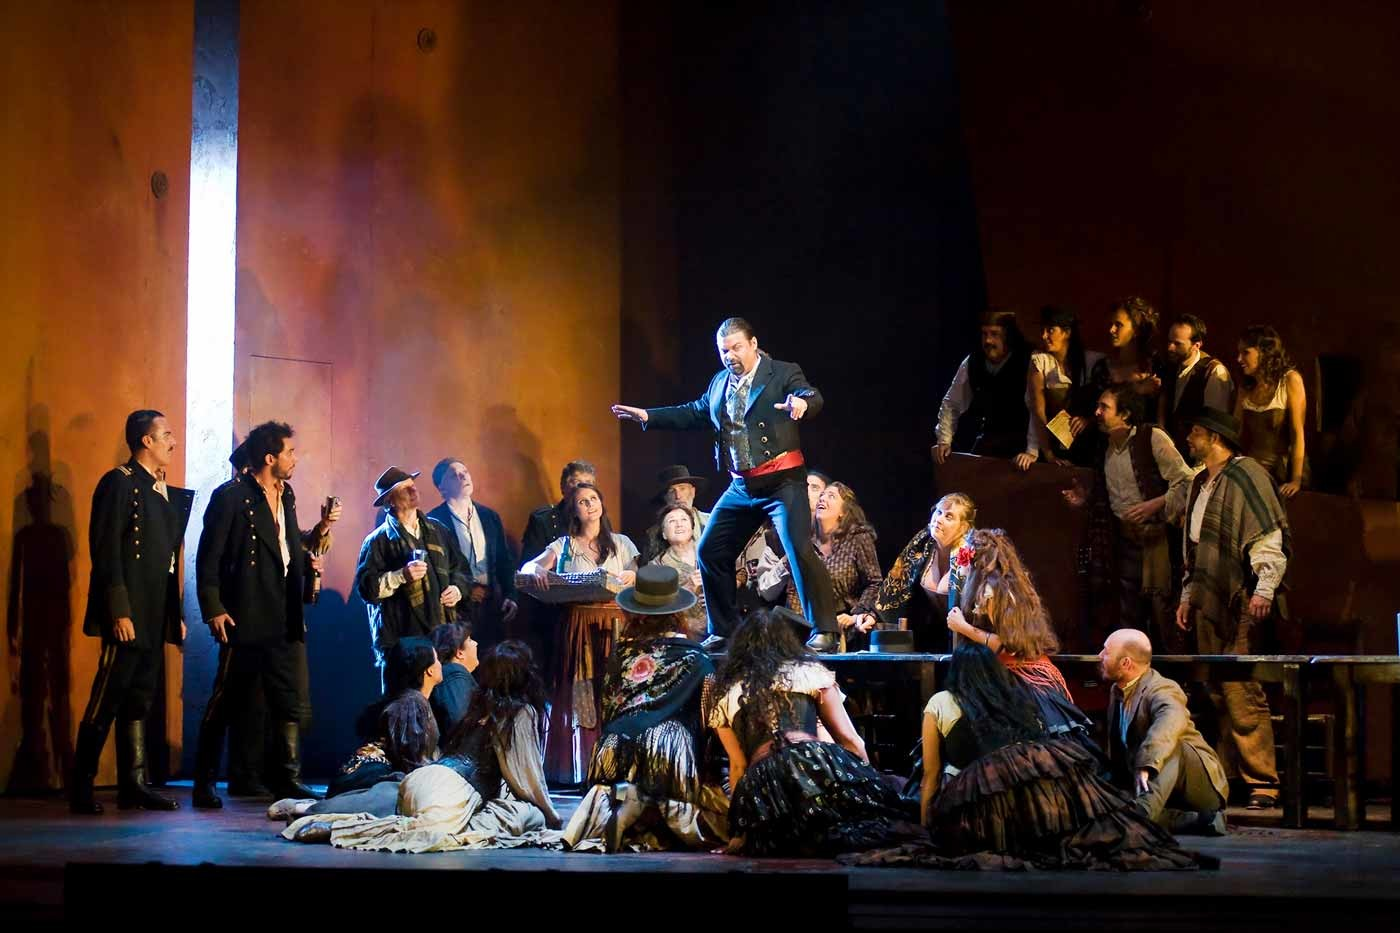 Simon Thorpe, Baritone – Escamillo, Carmen – State Opera South Australia (SOSA)